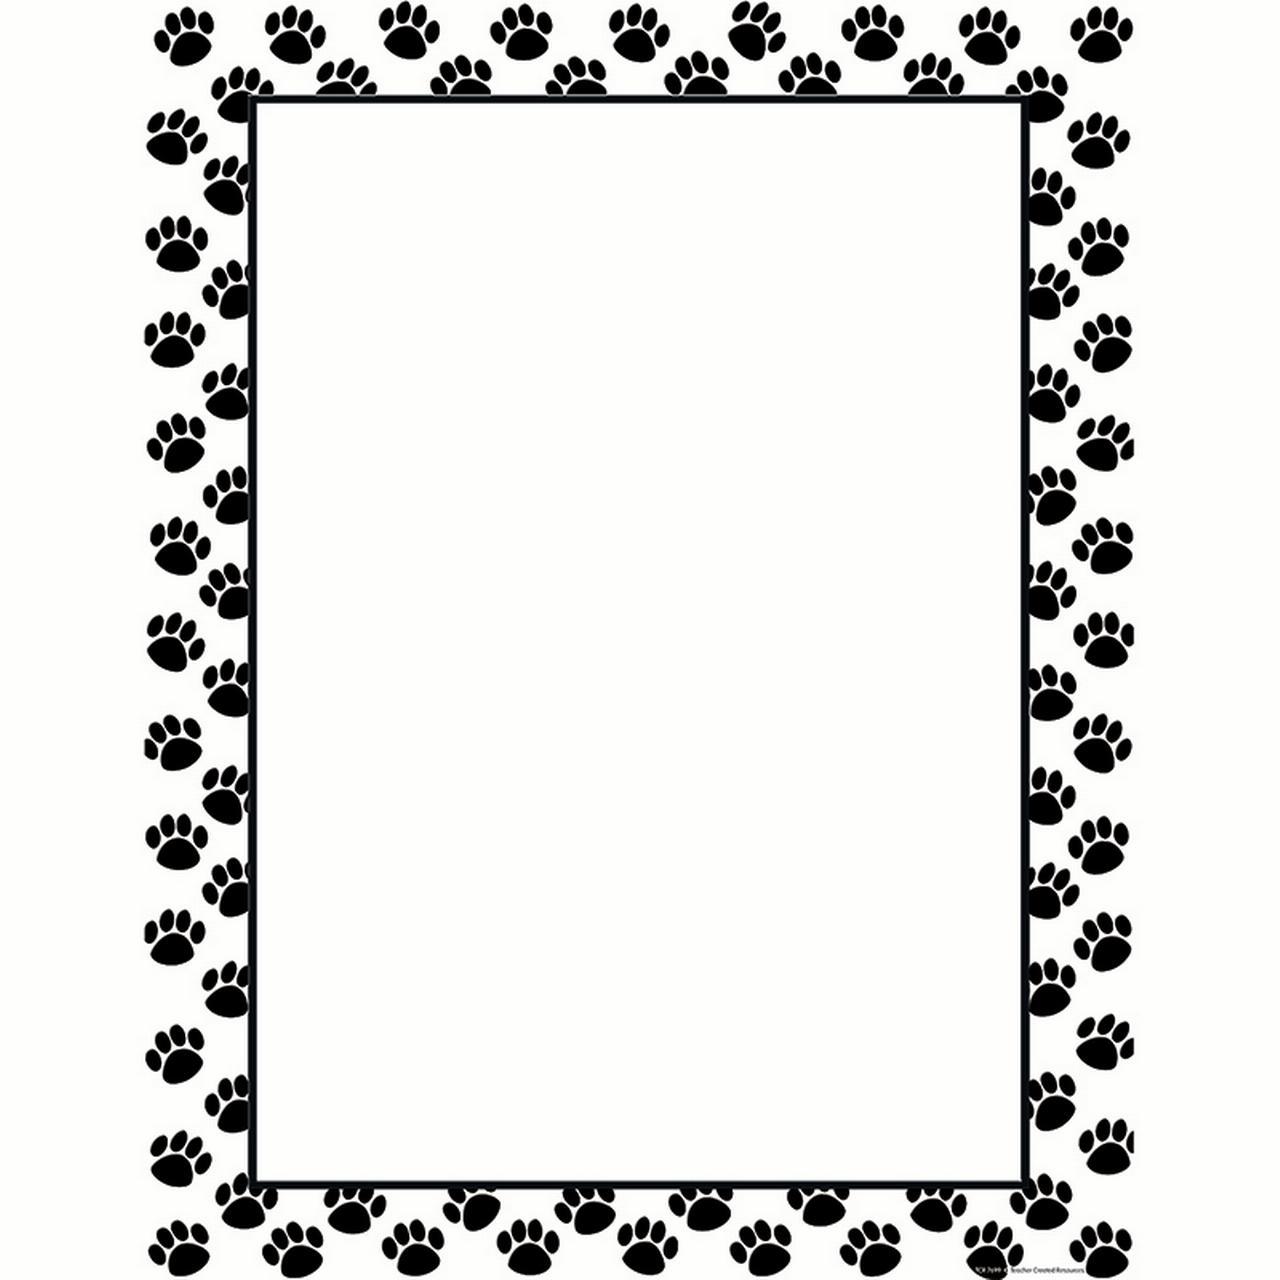 BLACK PAW PRINTS BLANK CHART